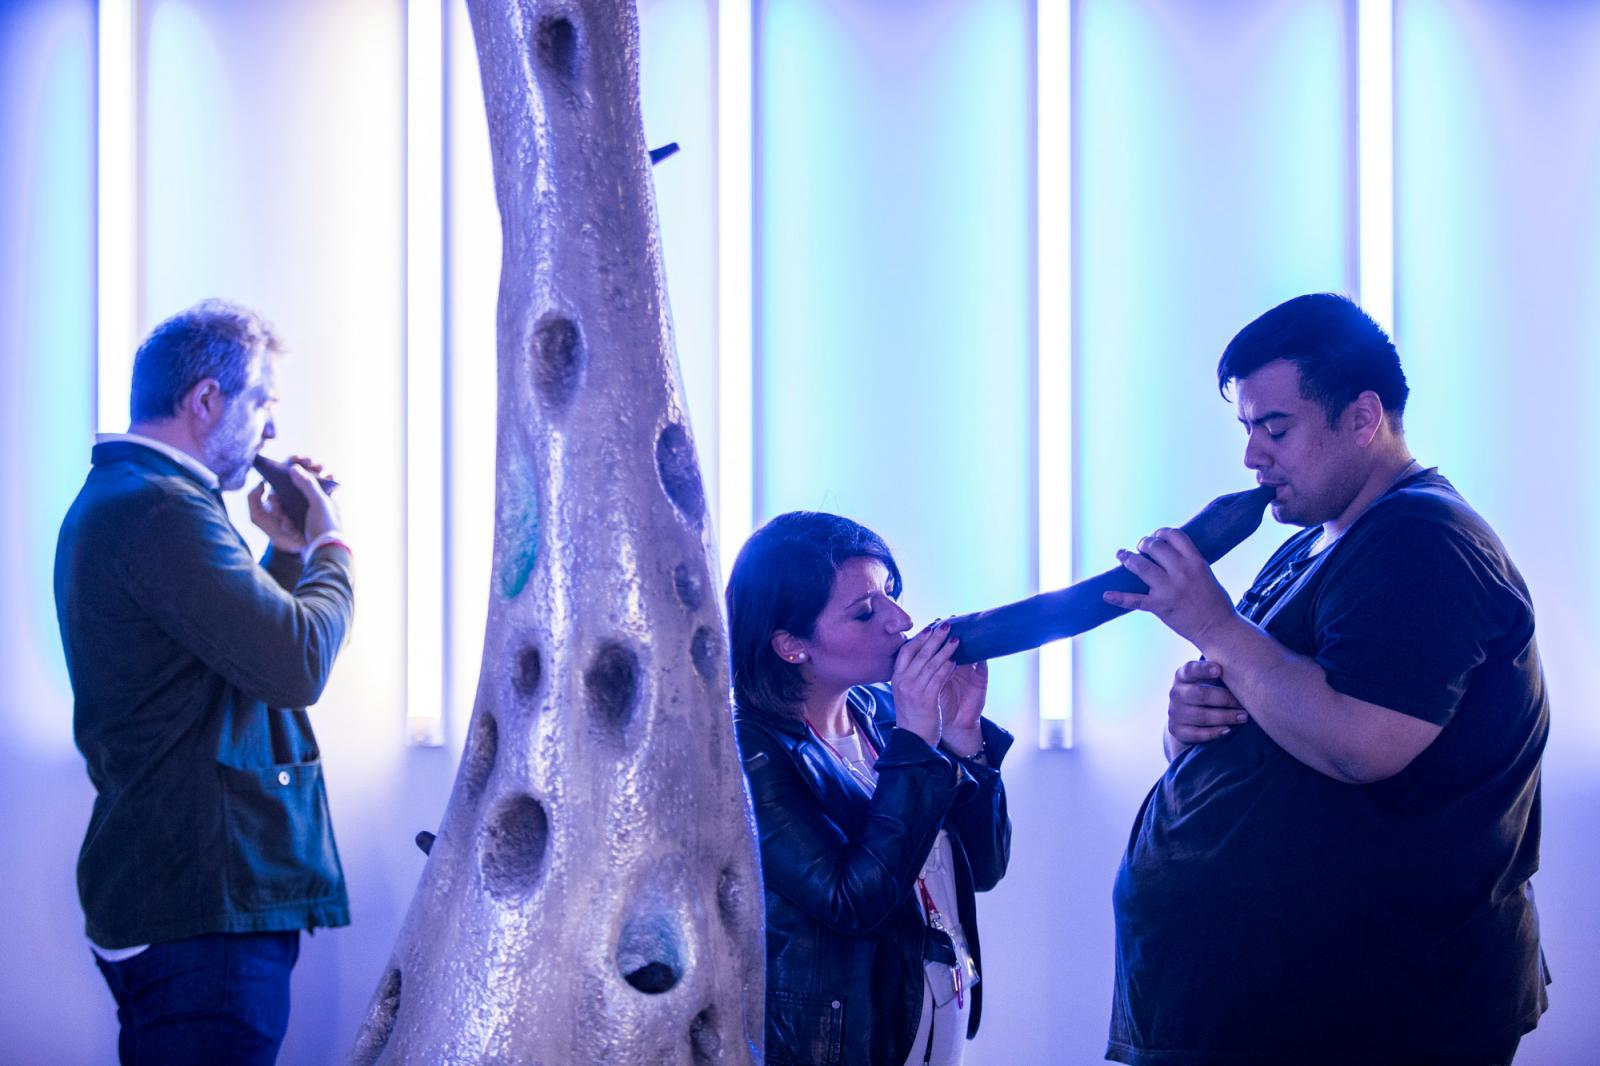 Ernesto Neto /Encounter with Huni Kuin – Boa Dance conducted Huni Kuin/(performance) Photo: Jacopo Salvi